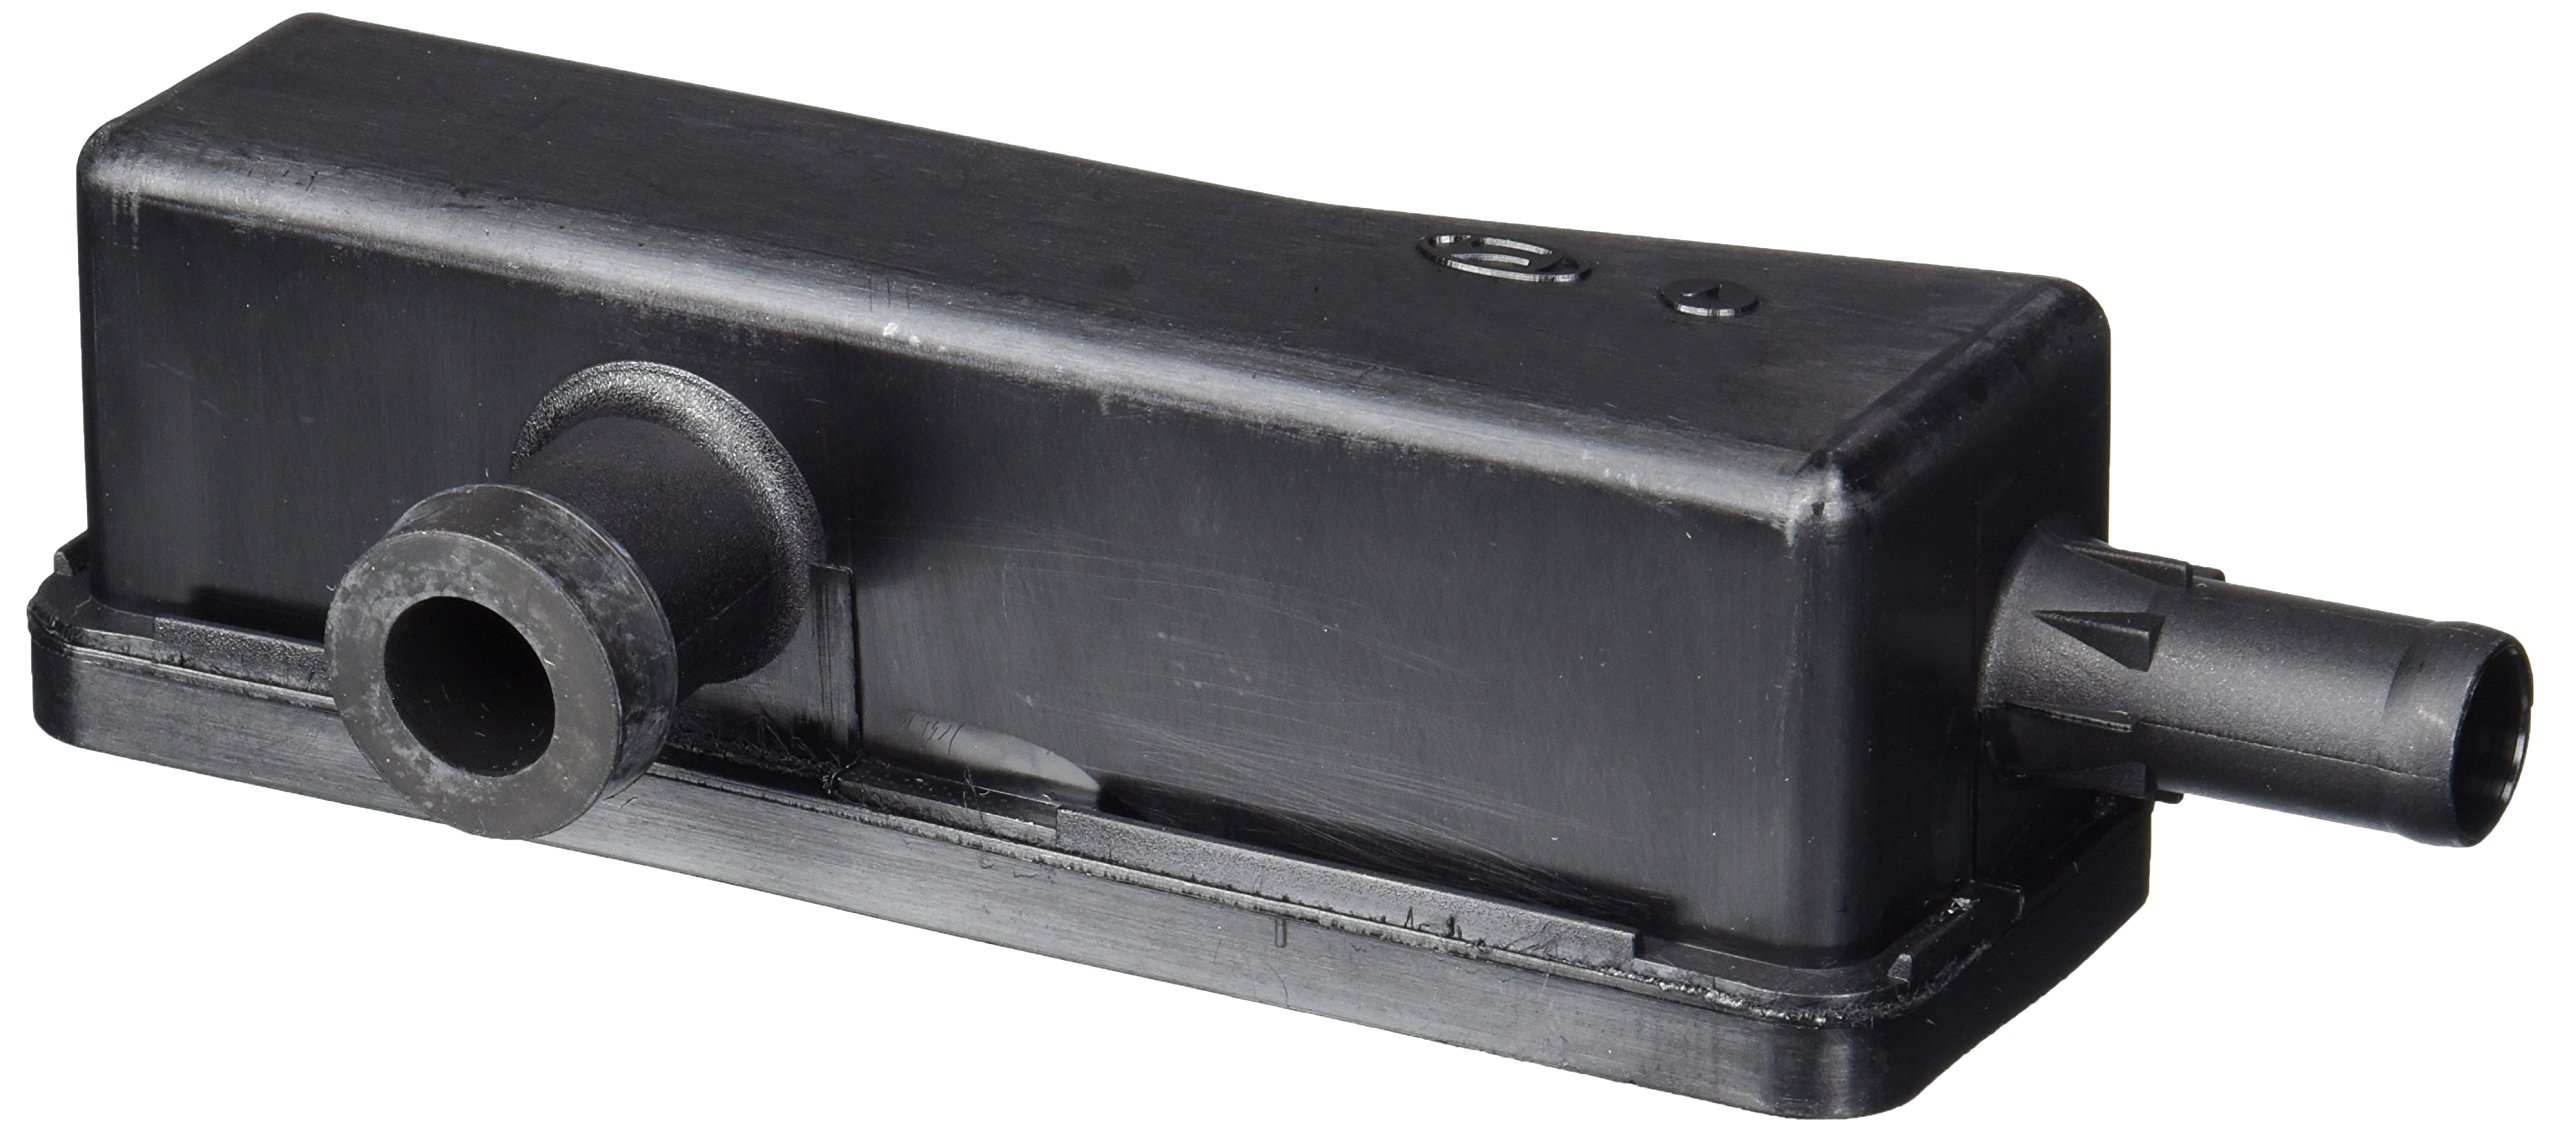 Kia 31453-26300 Vapor Canister Filter